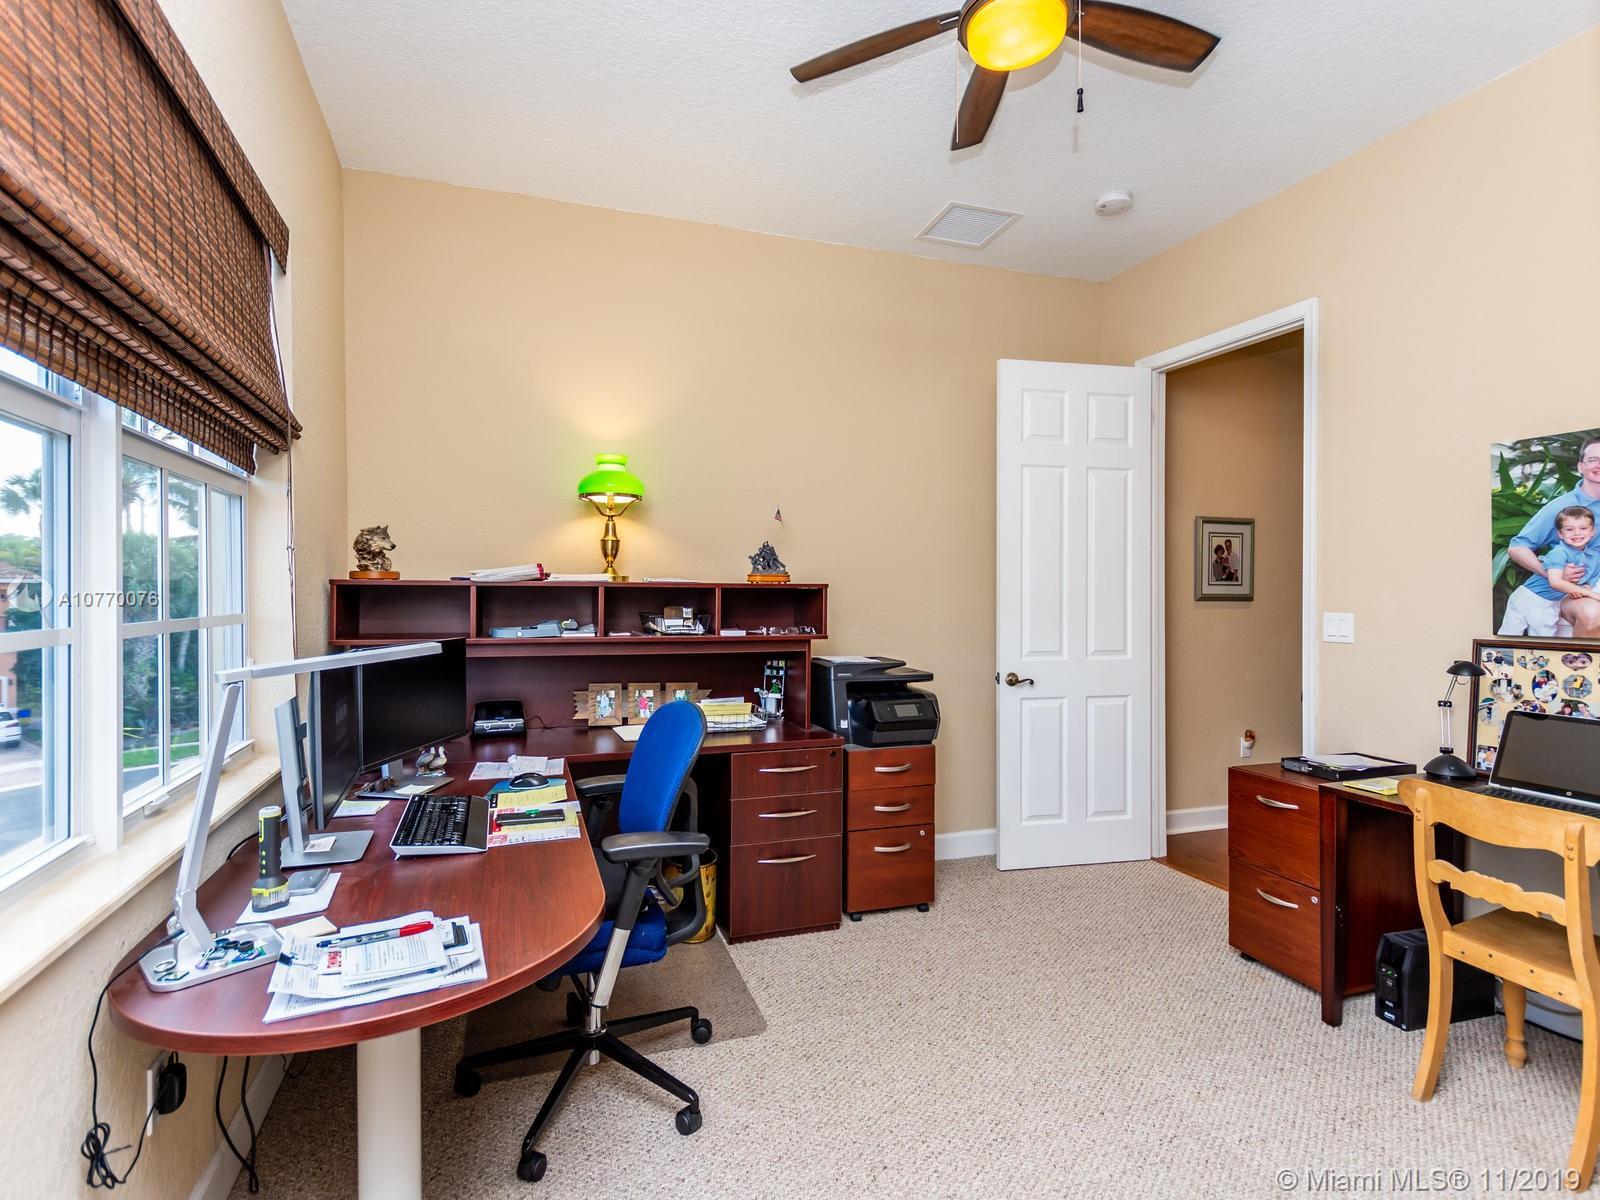 Homes for Sale in Zip Code 33437